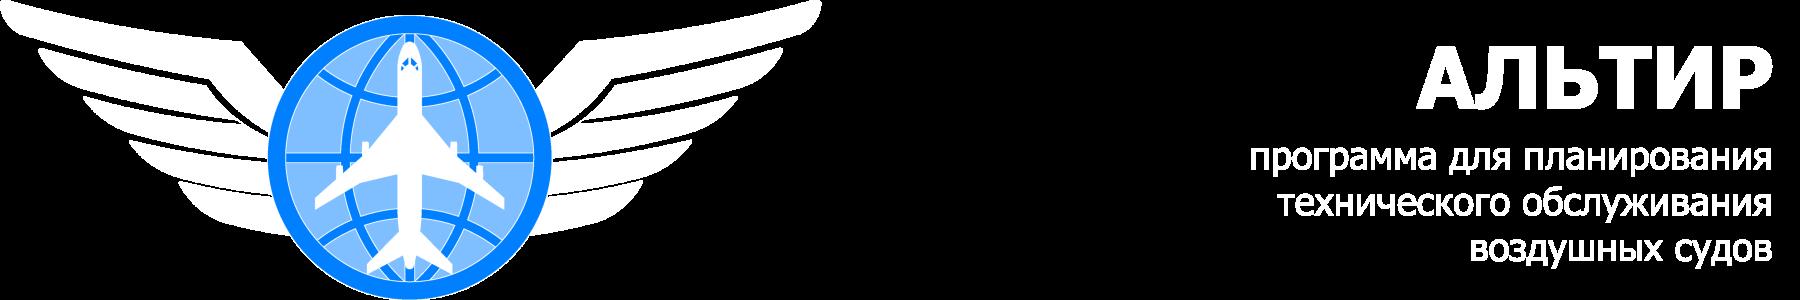 альтир логотип